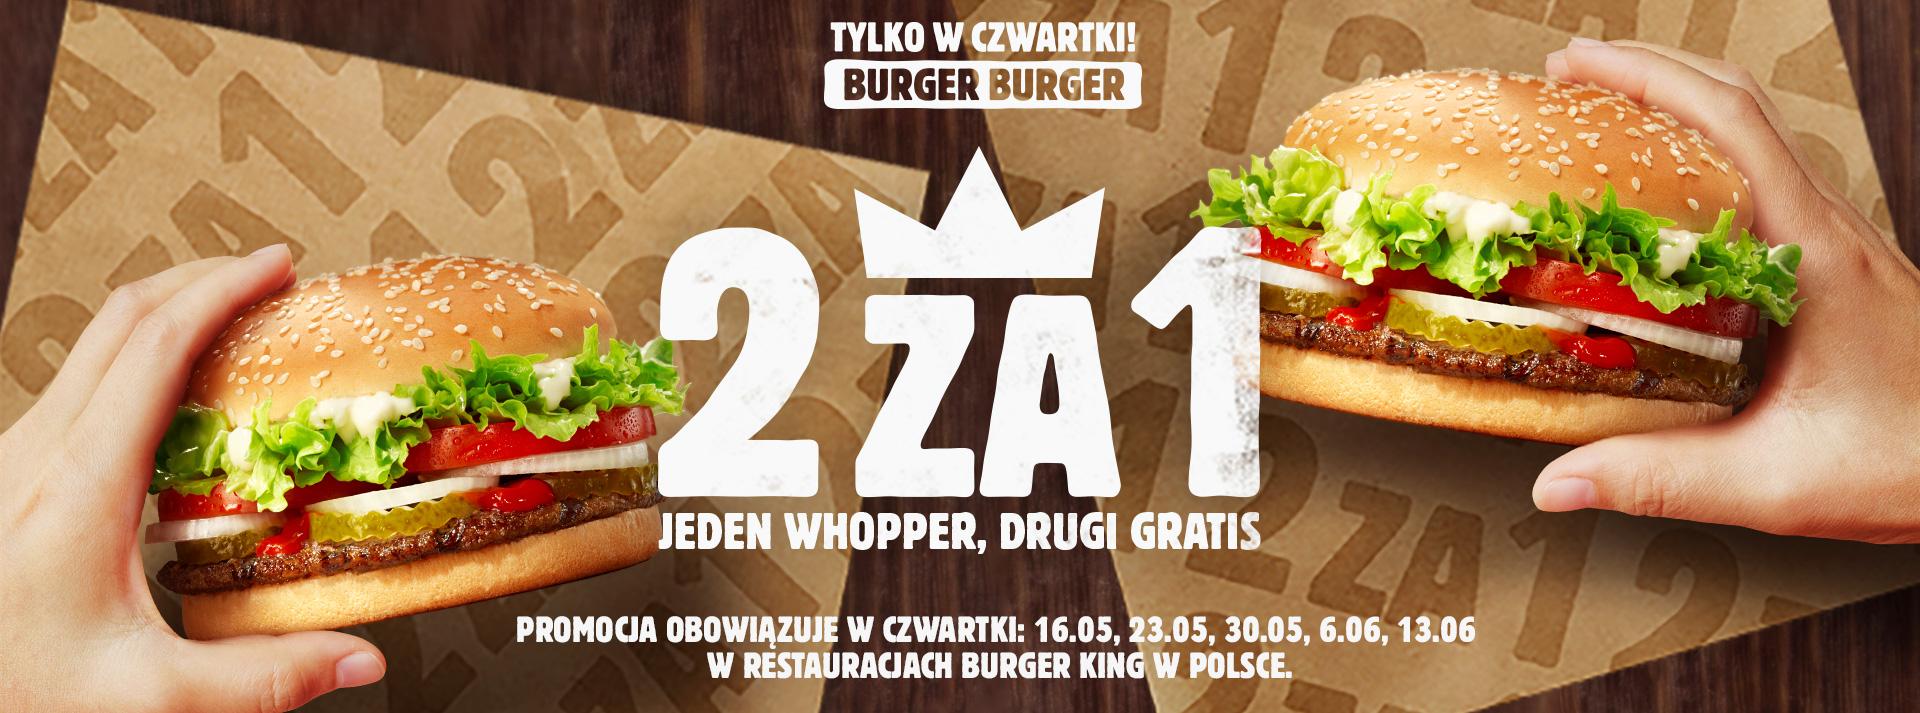 2 za 1. Drugi Whopper Gratis w Burger King tylko w czwartki !